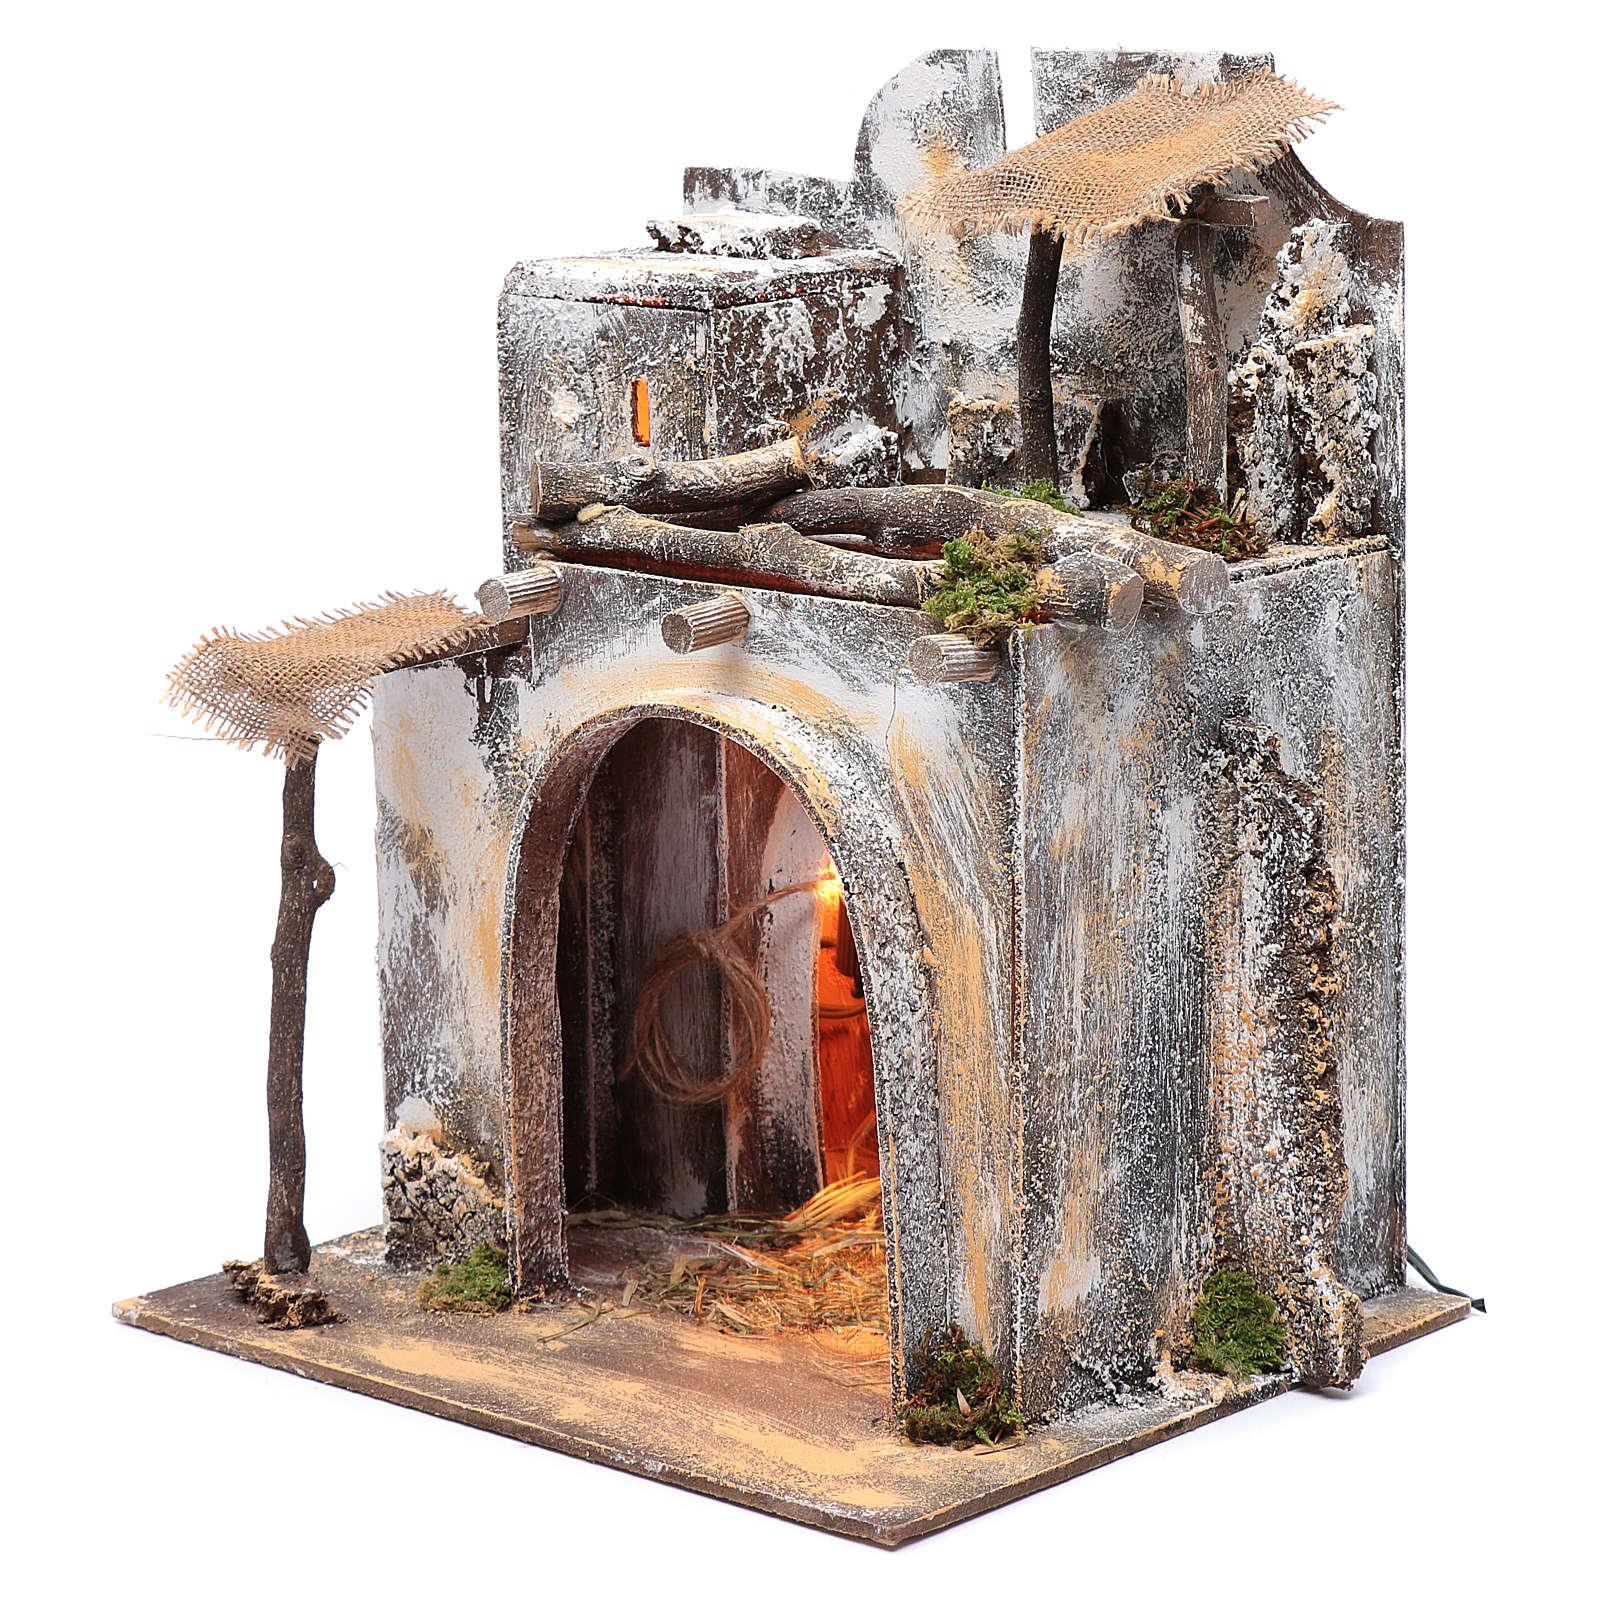 Neapolitan nativity scene Arabian house  35x30x25 cm with light and hut with straw 4